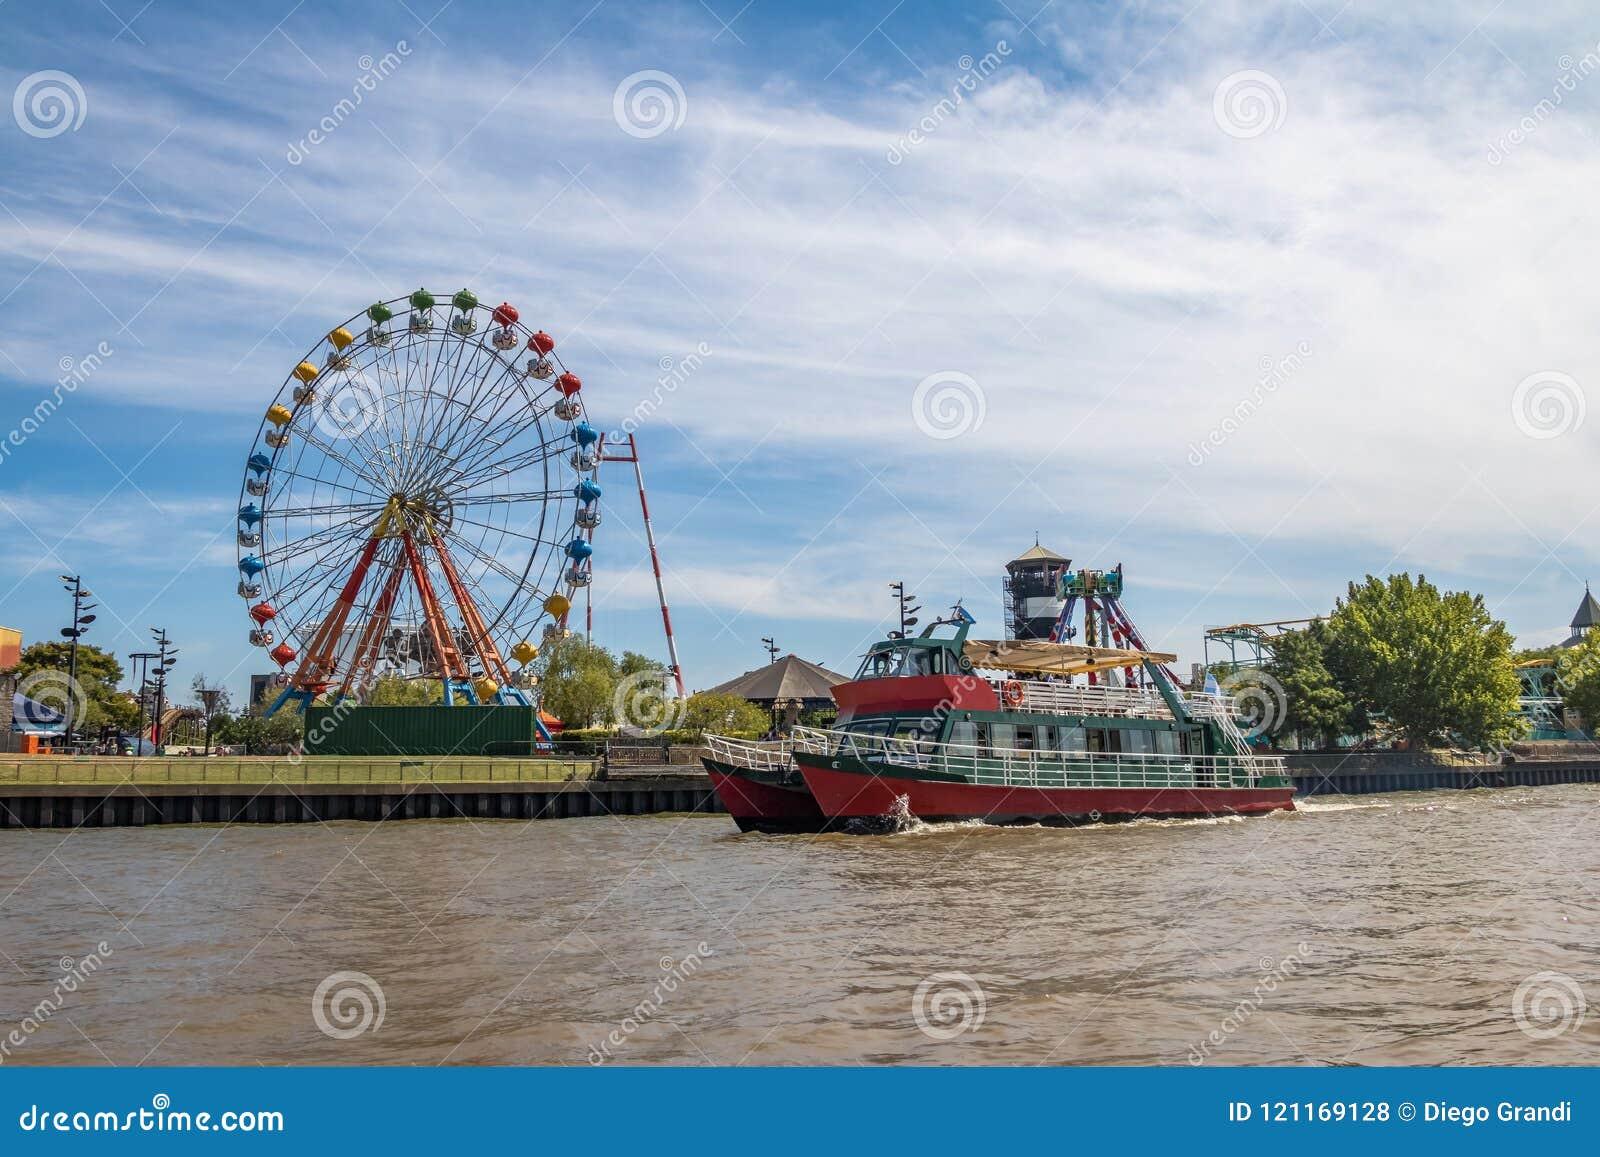 Колесо, парк атракционов и паром Ferris в реке Lujan - Tigre, Буэносе-Айрес, Аргентине